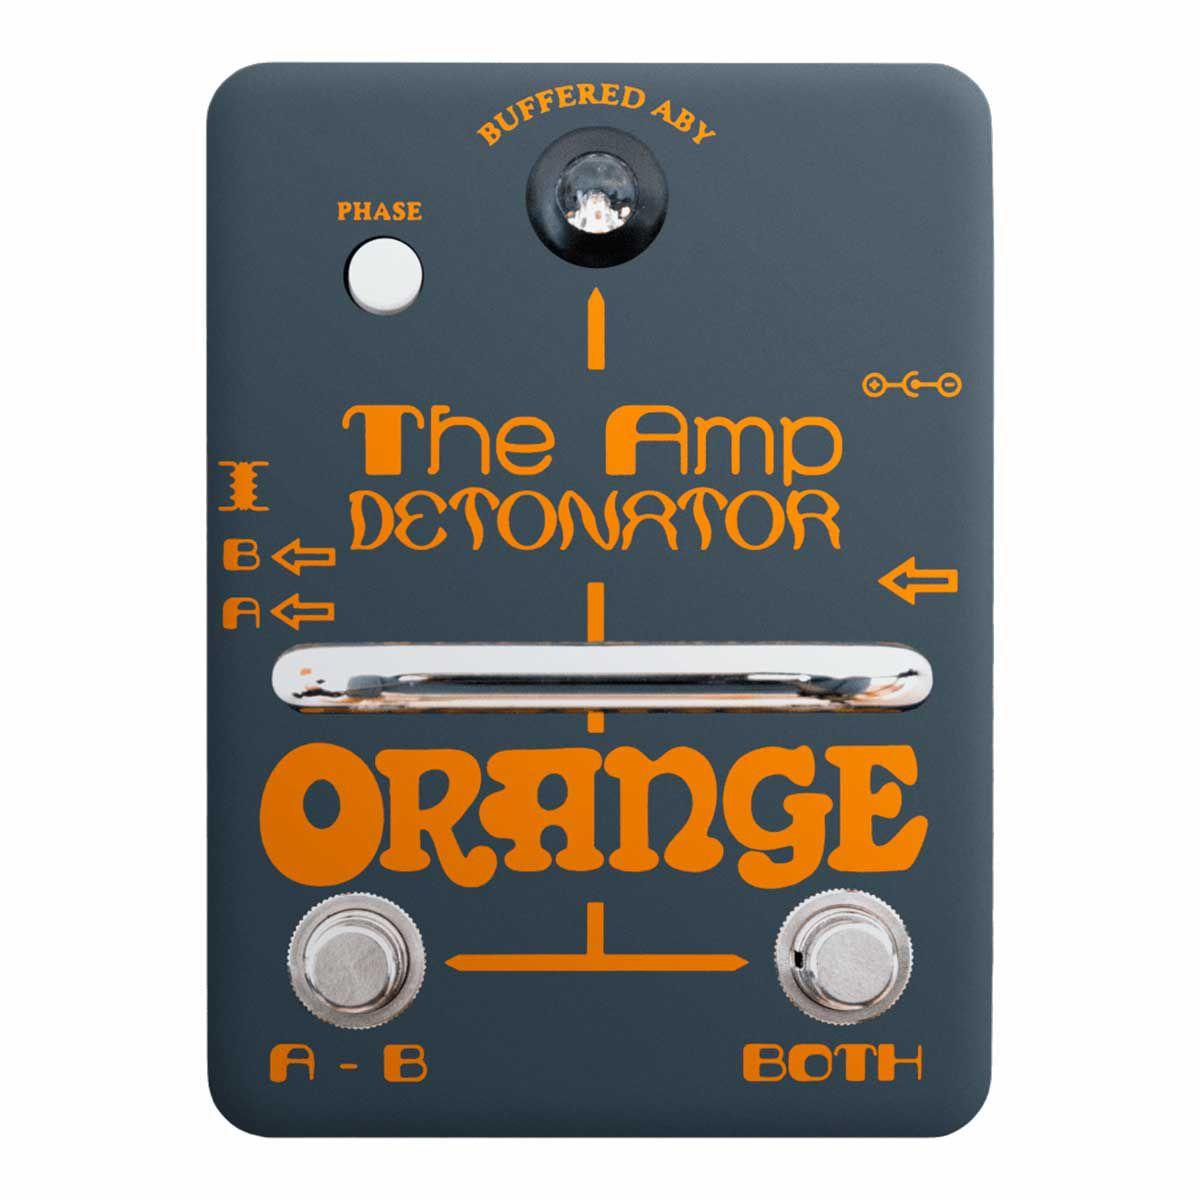 Pedal Orange Switch Amp Detonator Buffered ABY